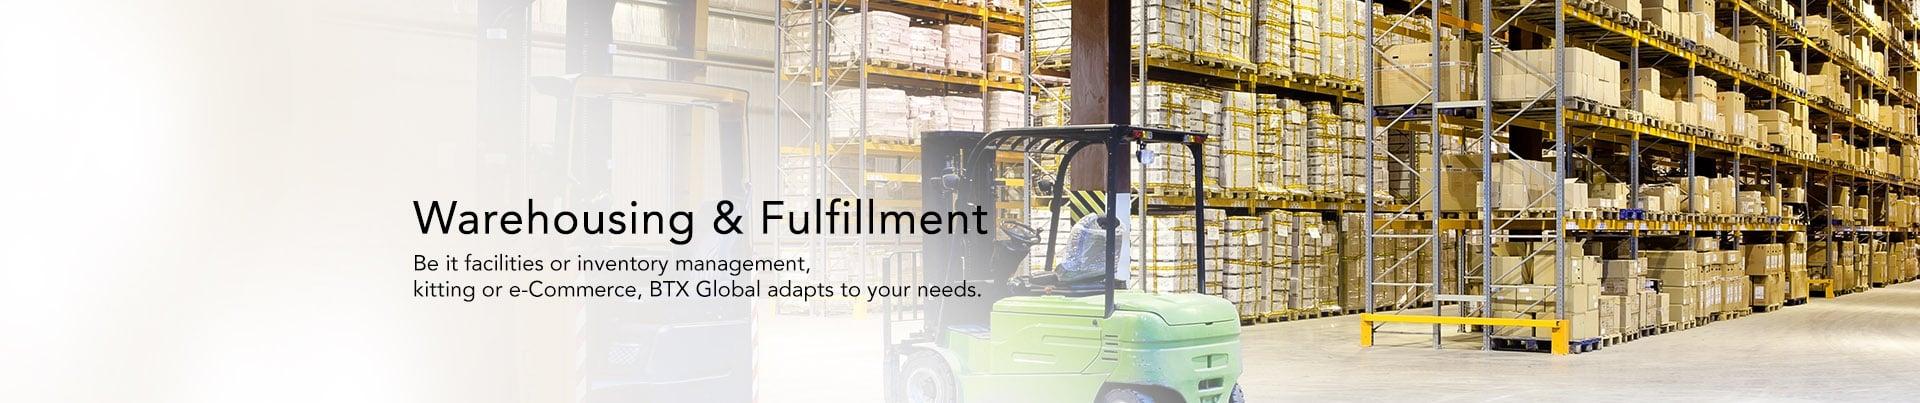 Warehousing & Fulfillment Services